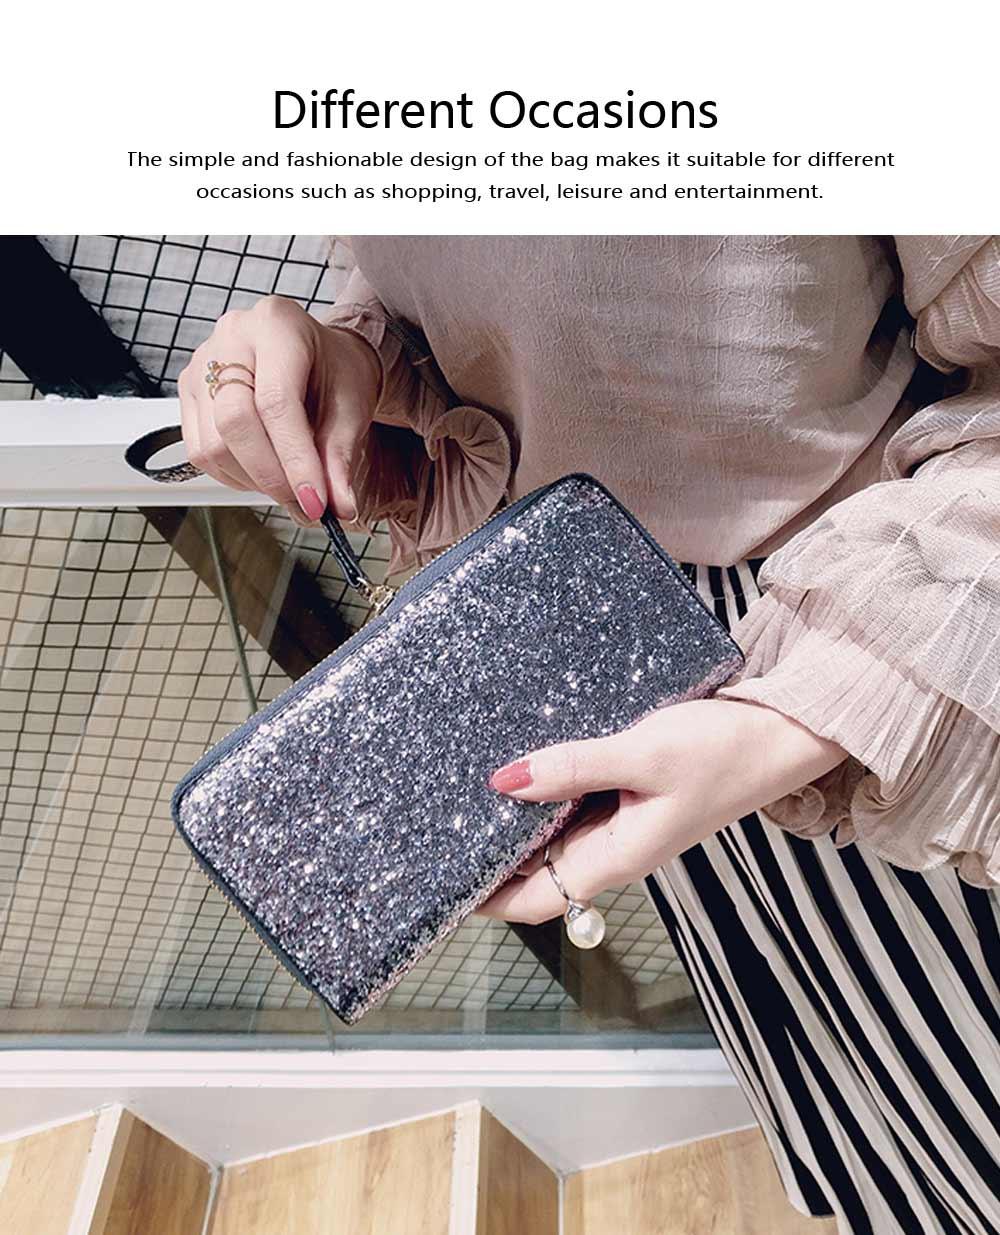 2019 Newest Evening Hand Bag Paillette Purse for Women Lady Girl, Fashionable Long Style Purse, Hand Clutch Bag, Simple Classic Purse 4 Colors 4